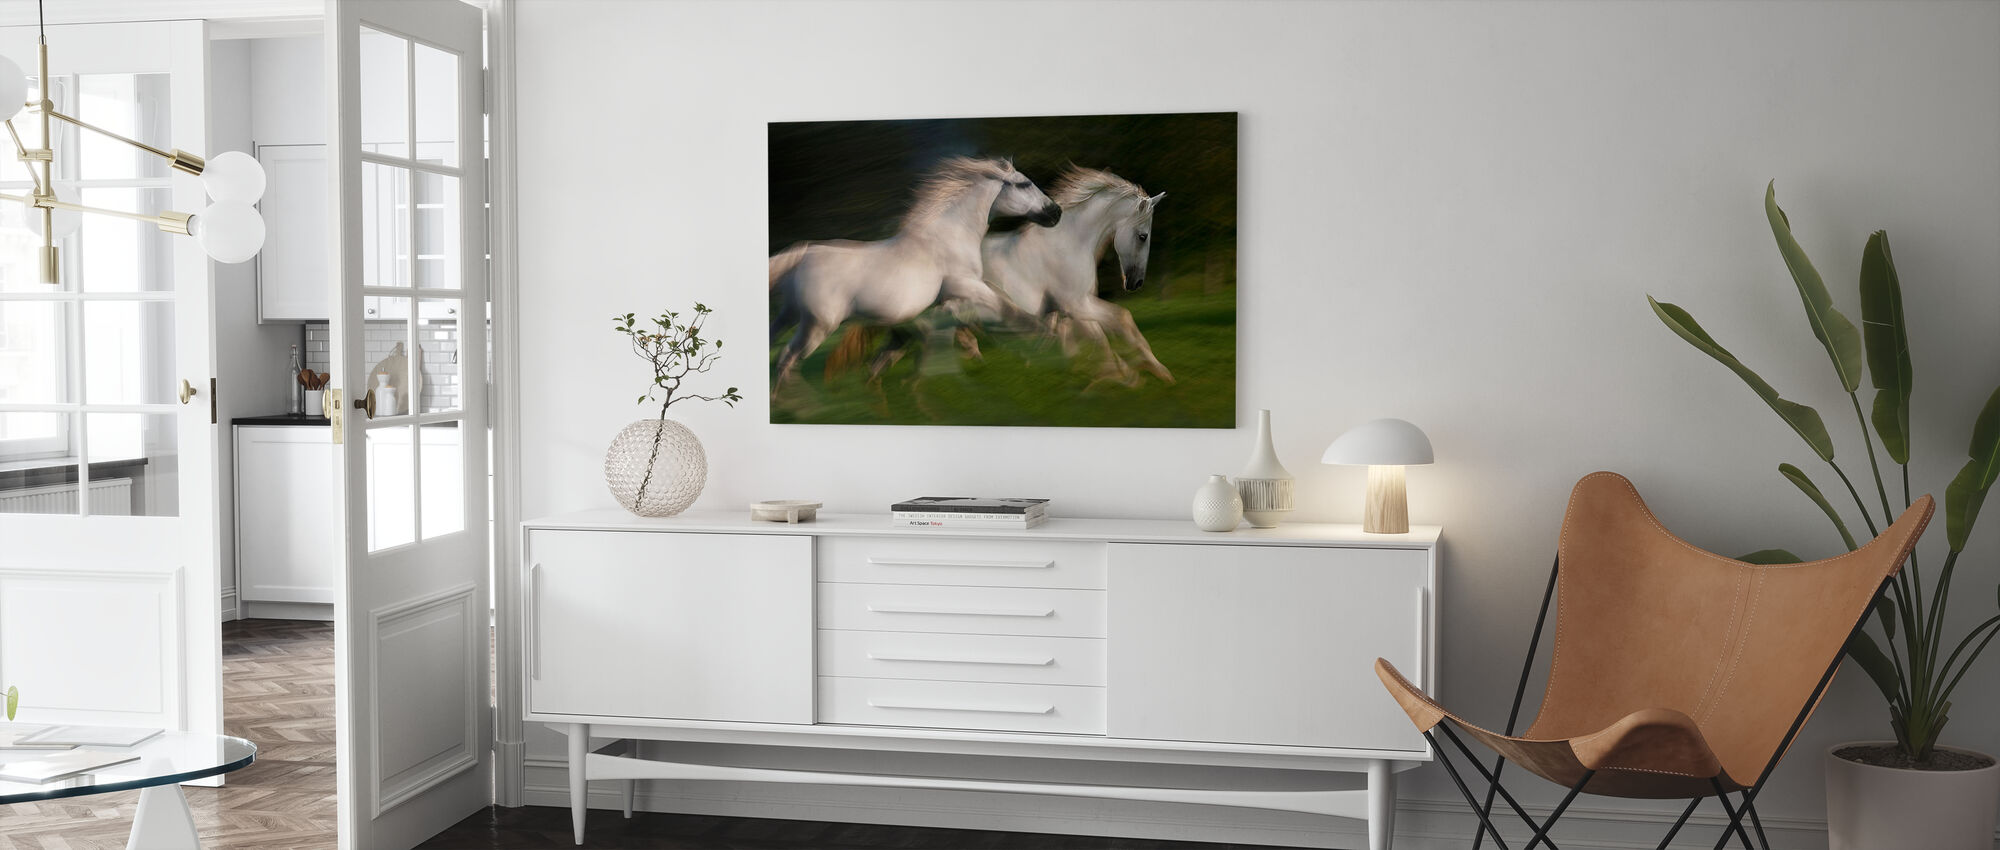 Witte Paarden Galop - Canvas print - Woonkamer